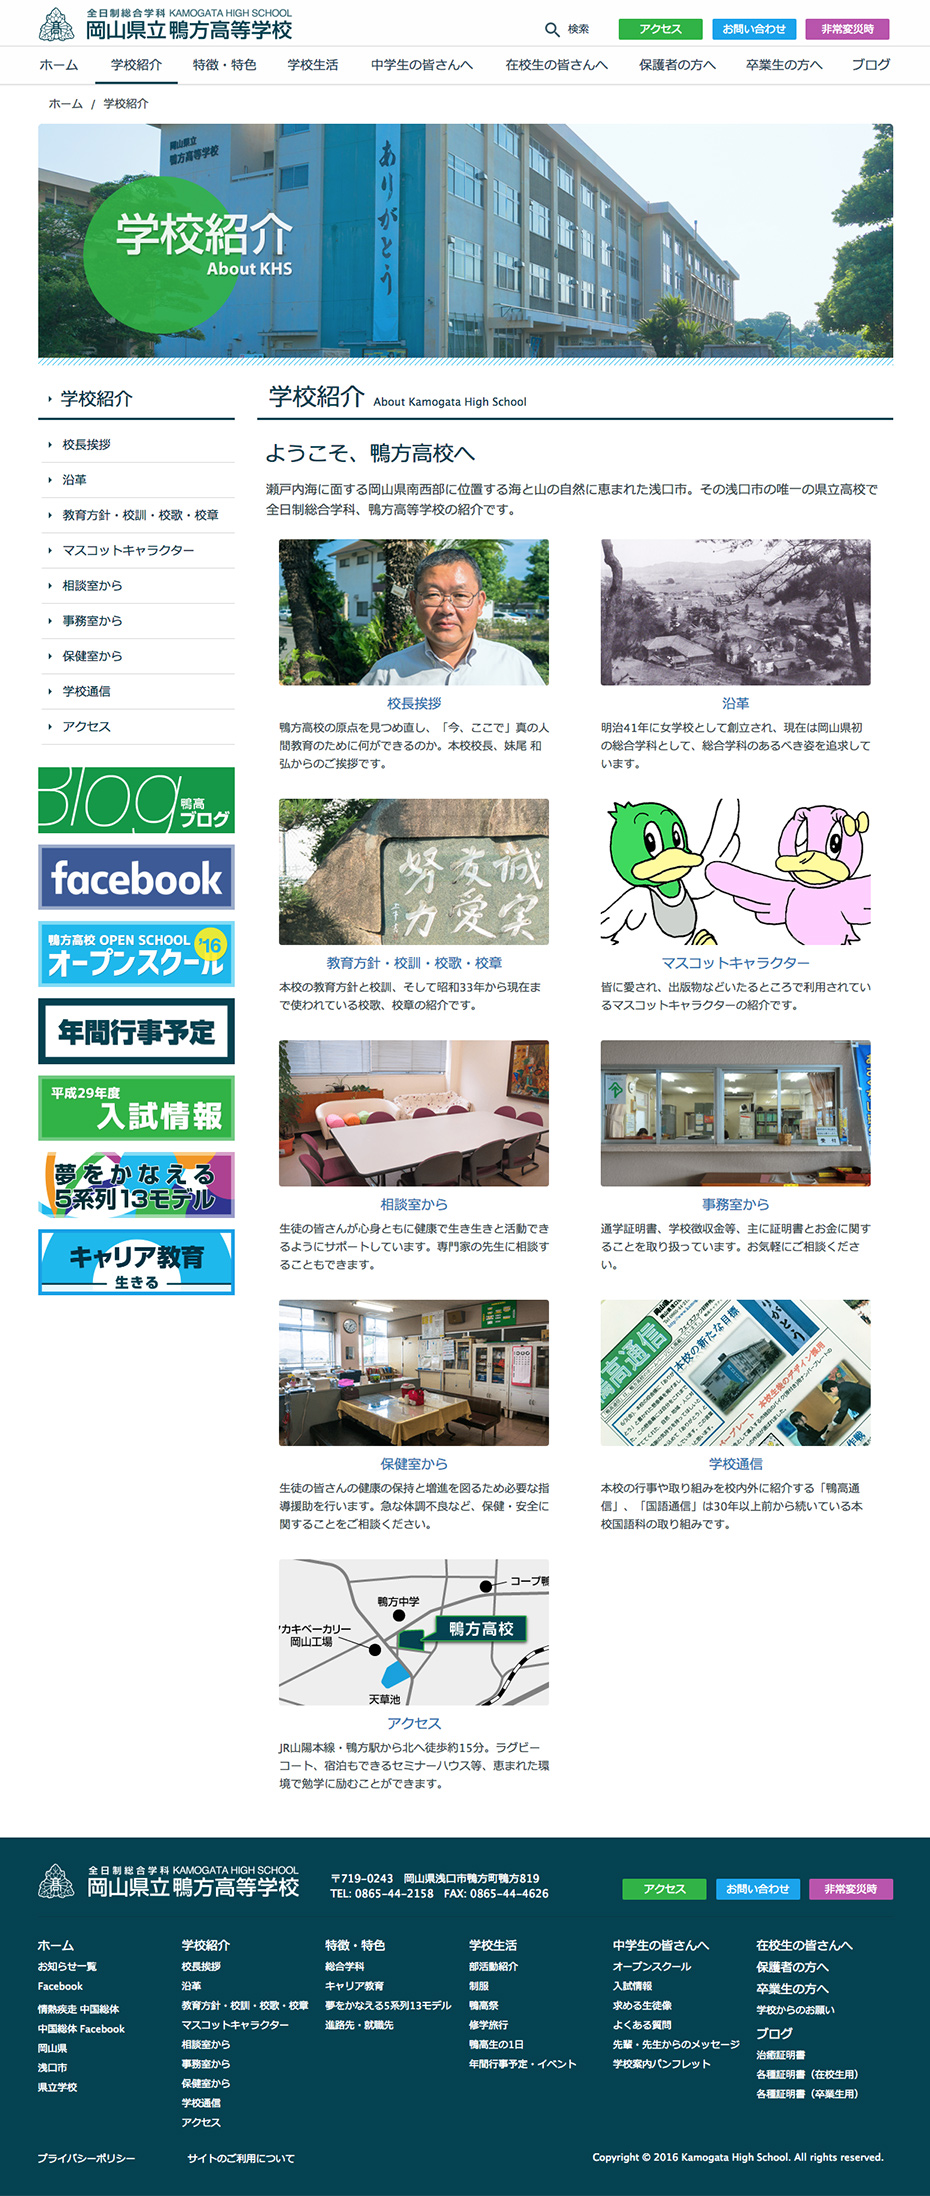 岡山県立鴨方高等学校様 ホームページ 学校紹介